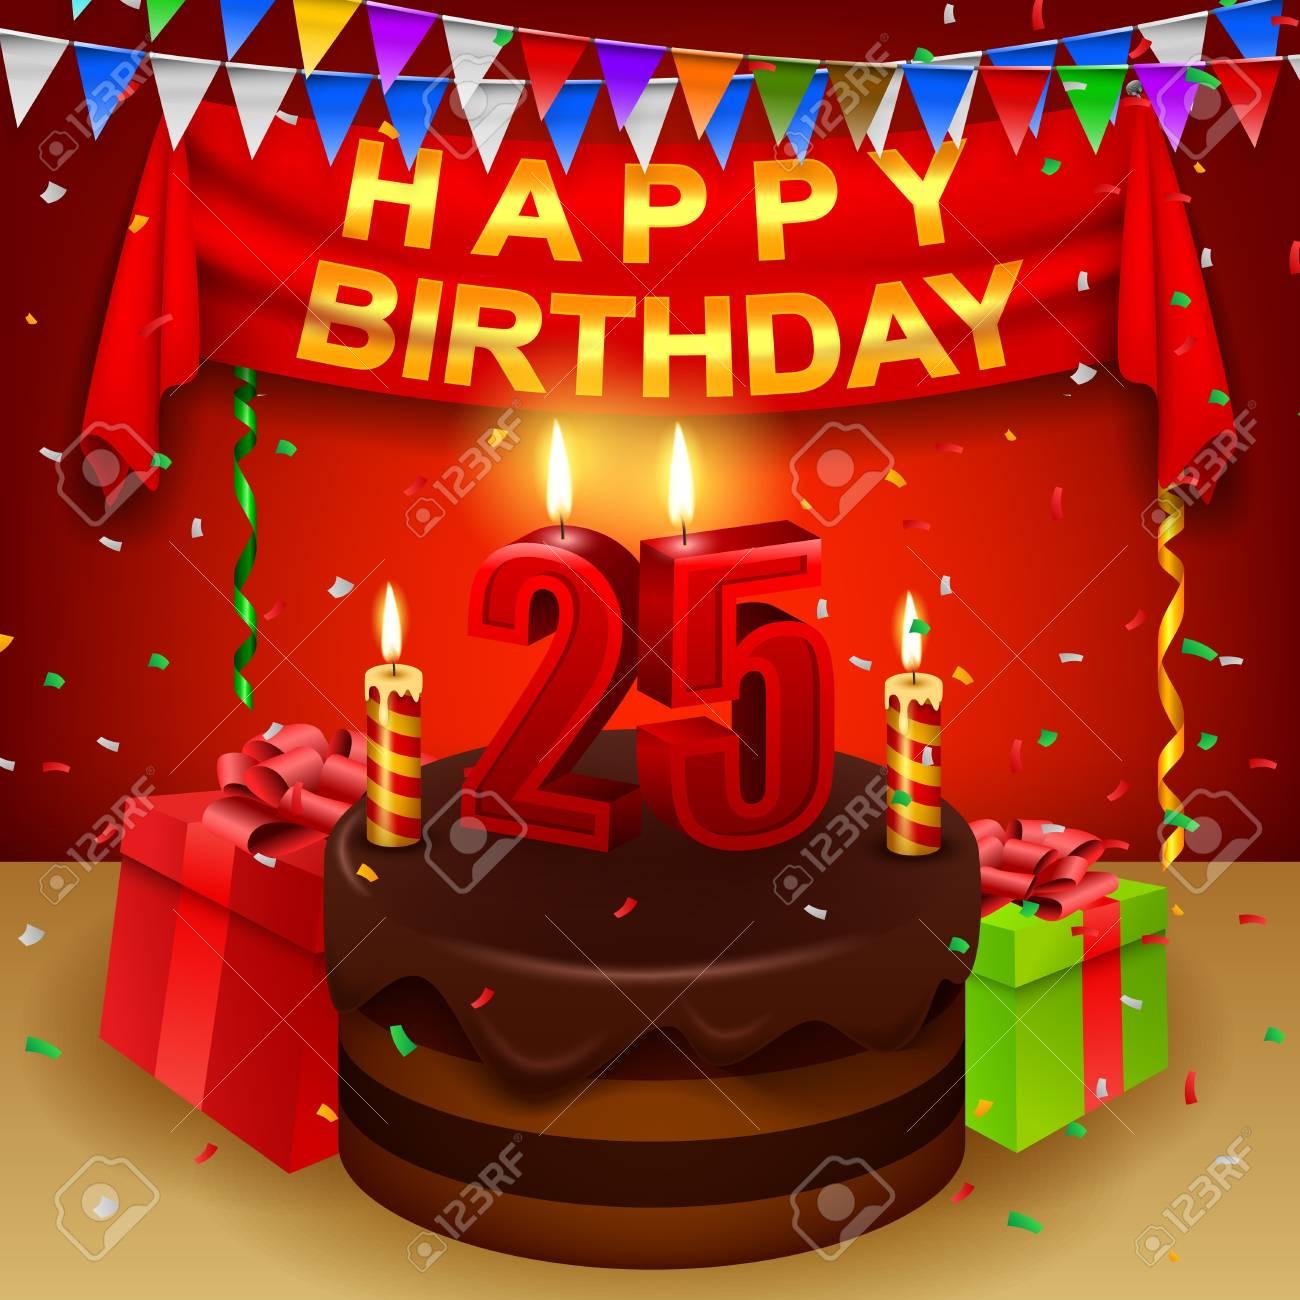 Happy 25th Birthday With Chocolate Cream Cake And Triangular